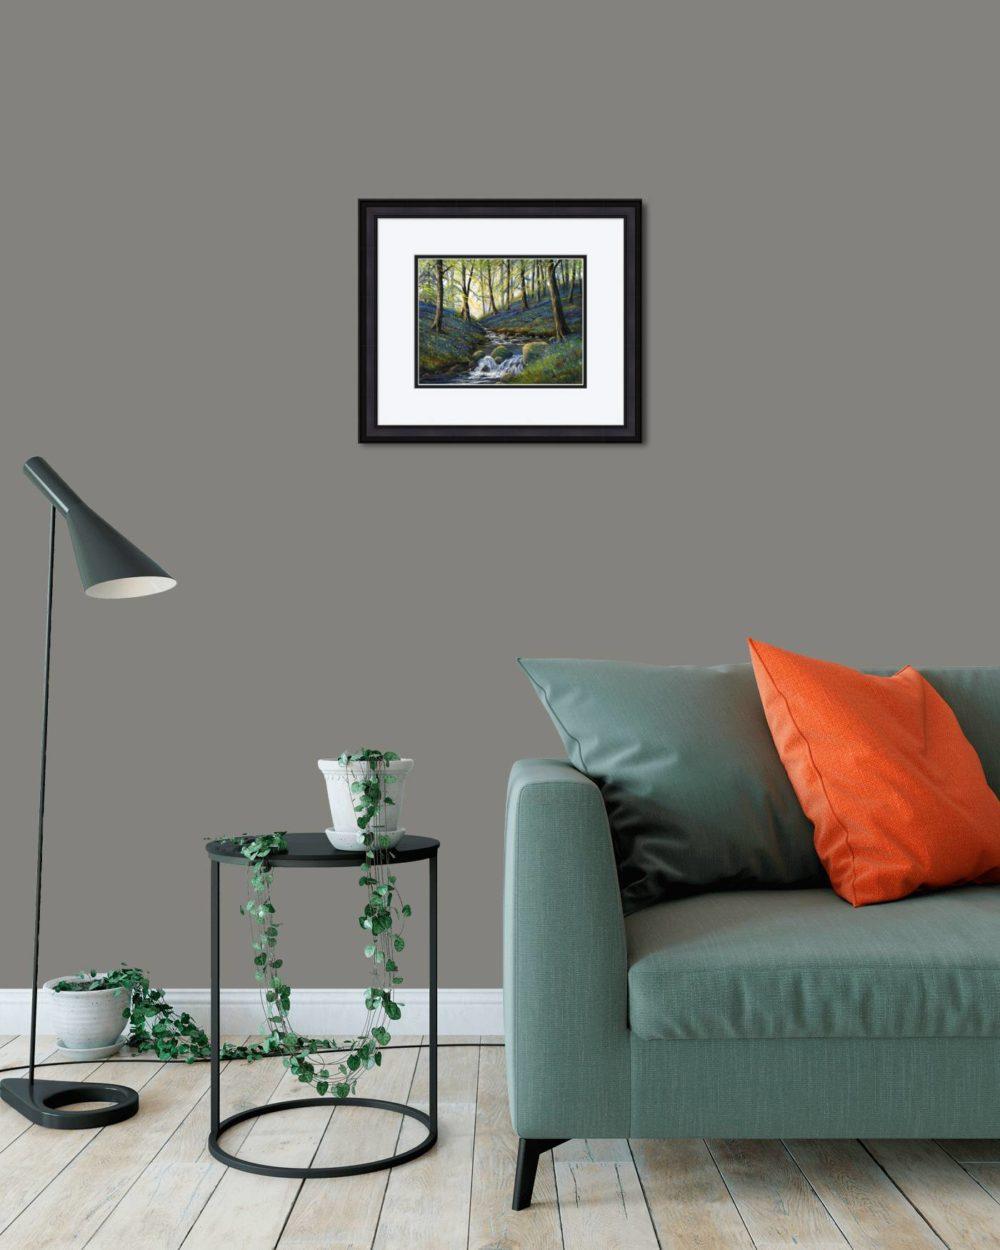 Bluebells Slatequarry Print (Small) in Black Frame in Room